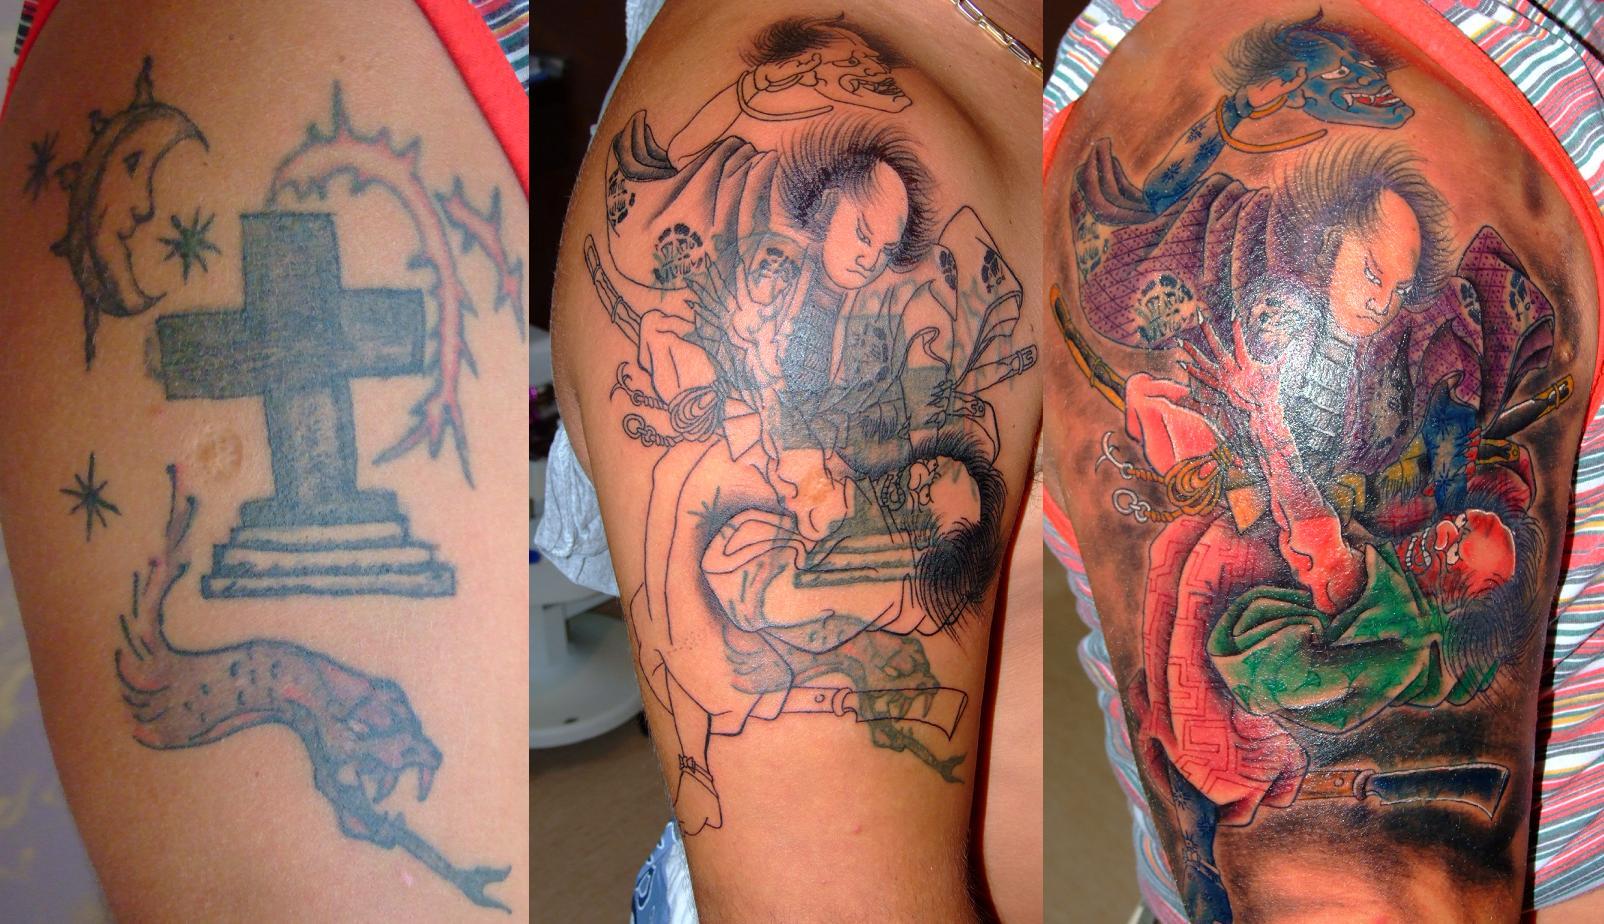 Samurai In Fight Cover Up Arm Tattoo Design Tattoomagz Tattoo Designs Ink Works Body Arts Gallery